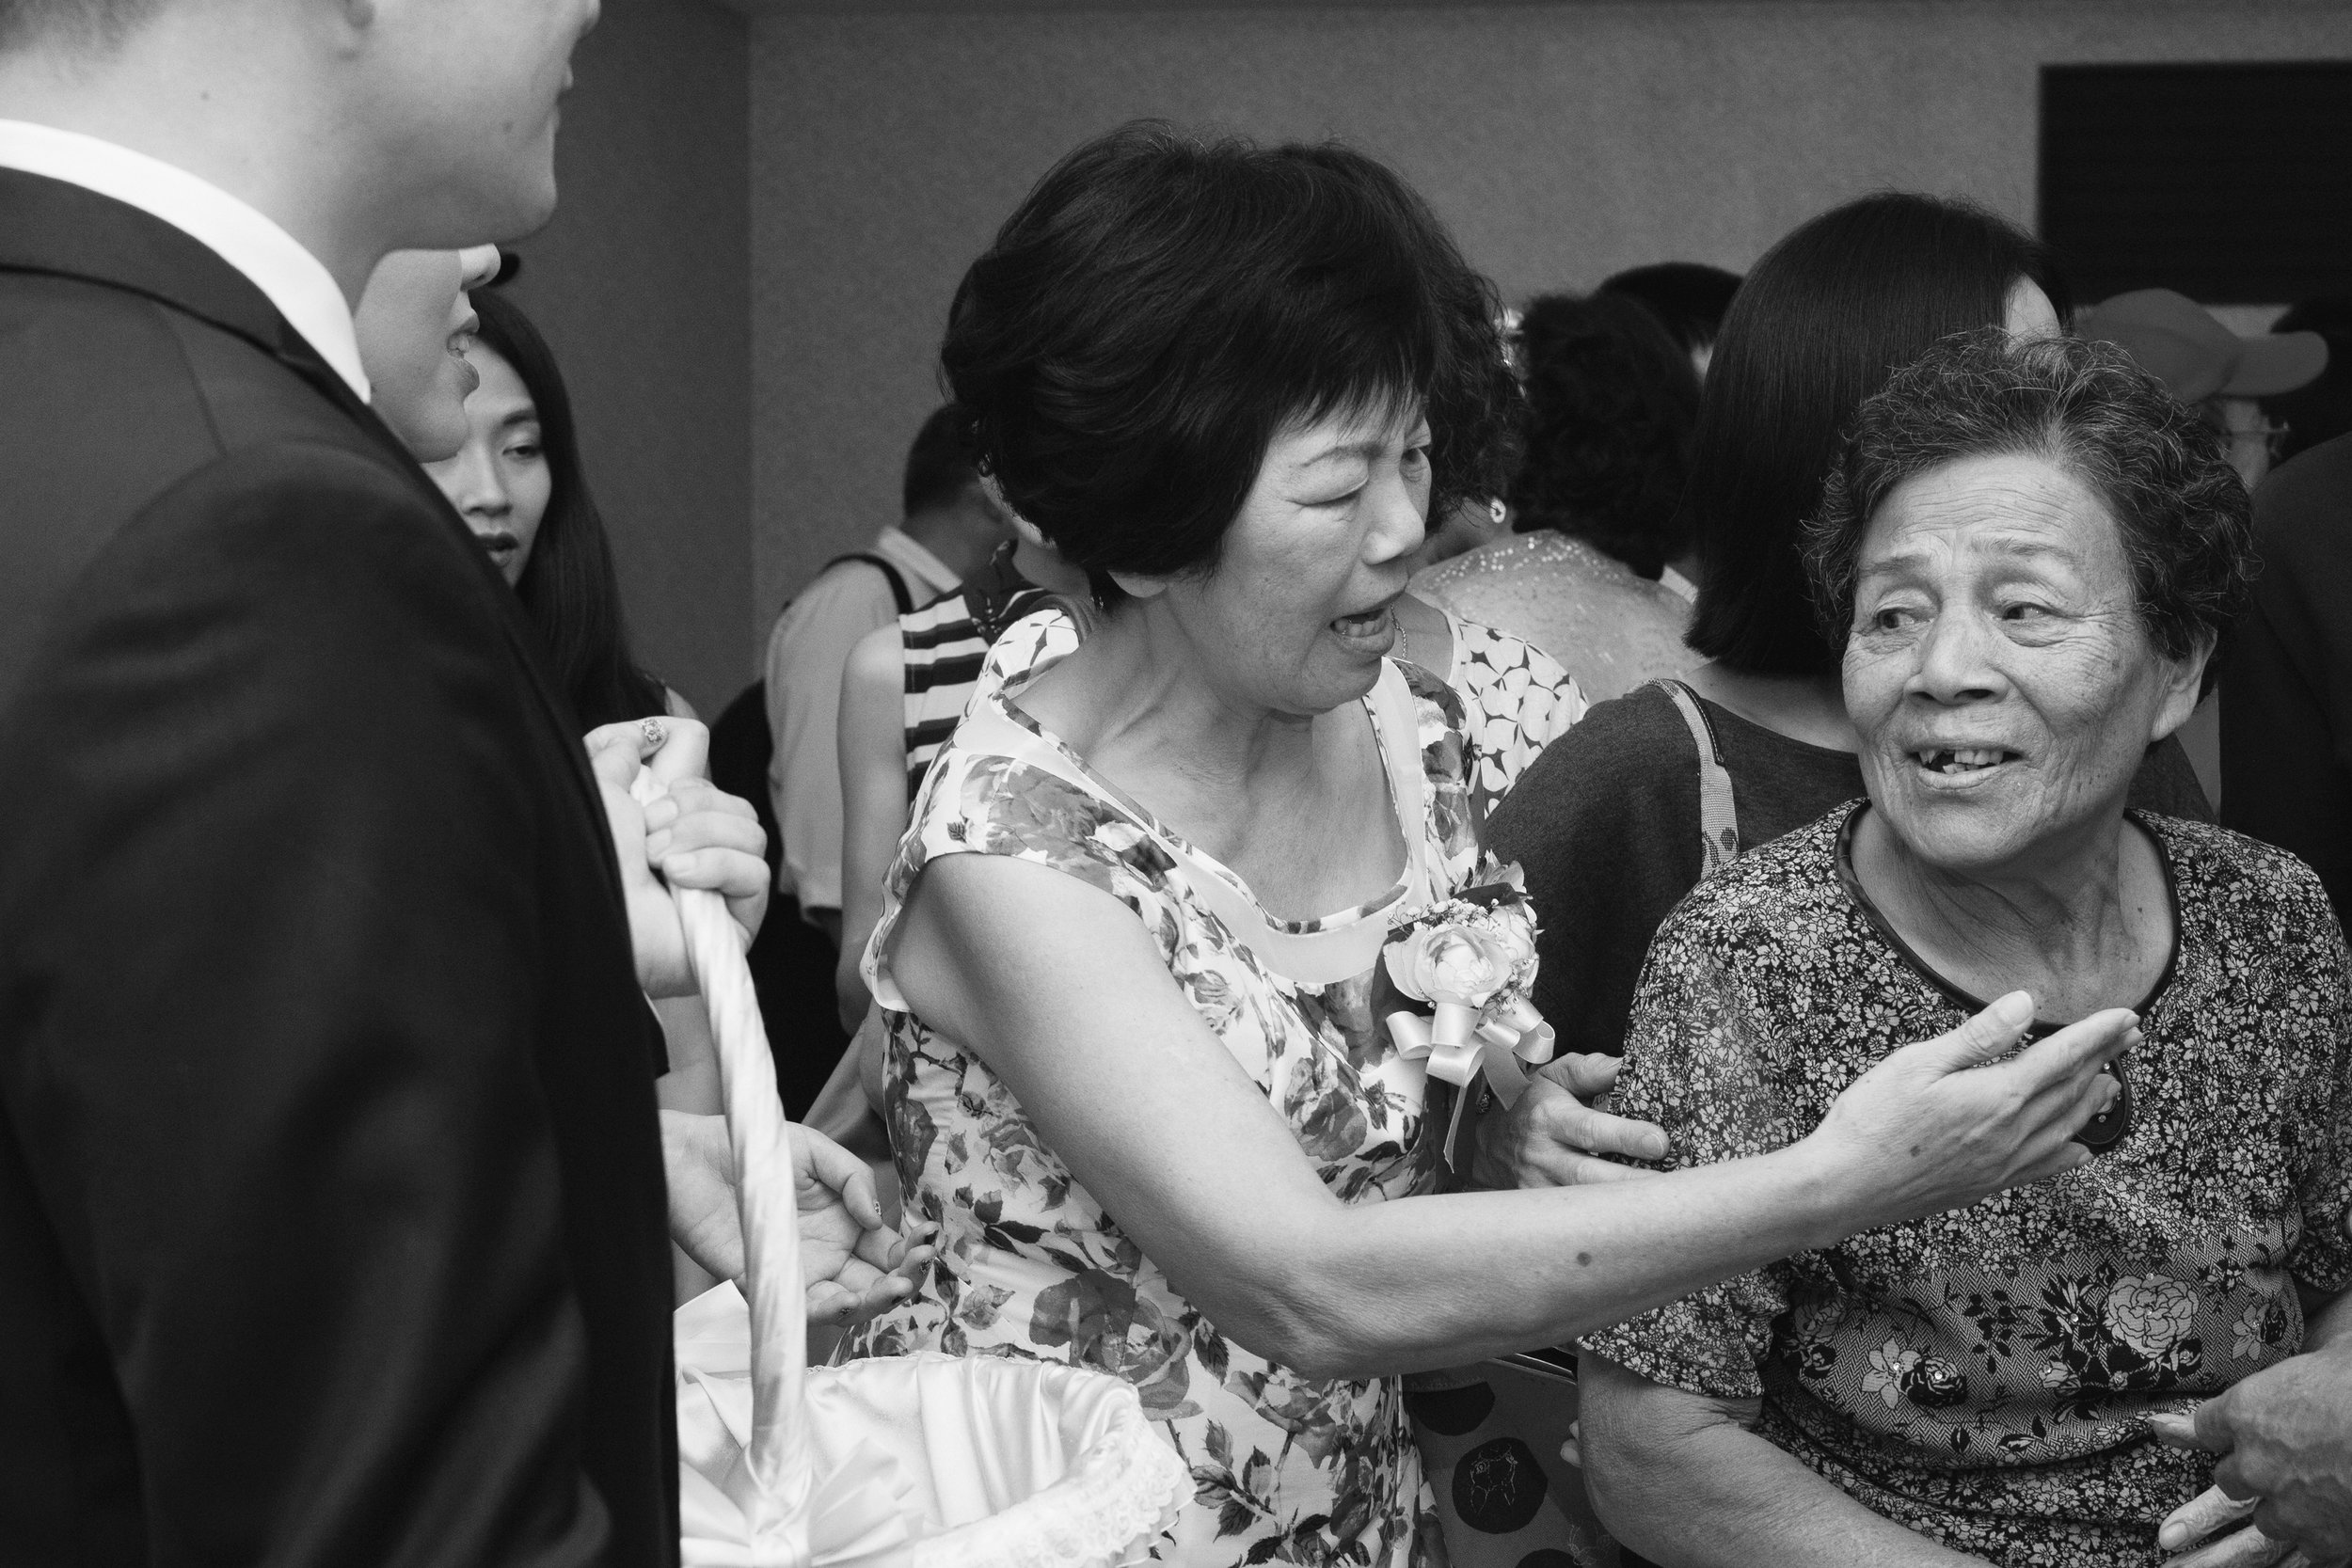 [JC]CREATIVE 女性攝影師 北投儷宴會館 補請台灣WEDDING    自然風格 台北婚攝推 女婚攝  桃園婚攝   圖像00387.JPG